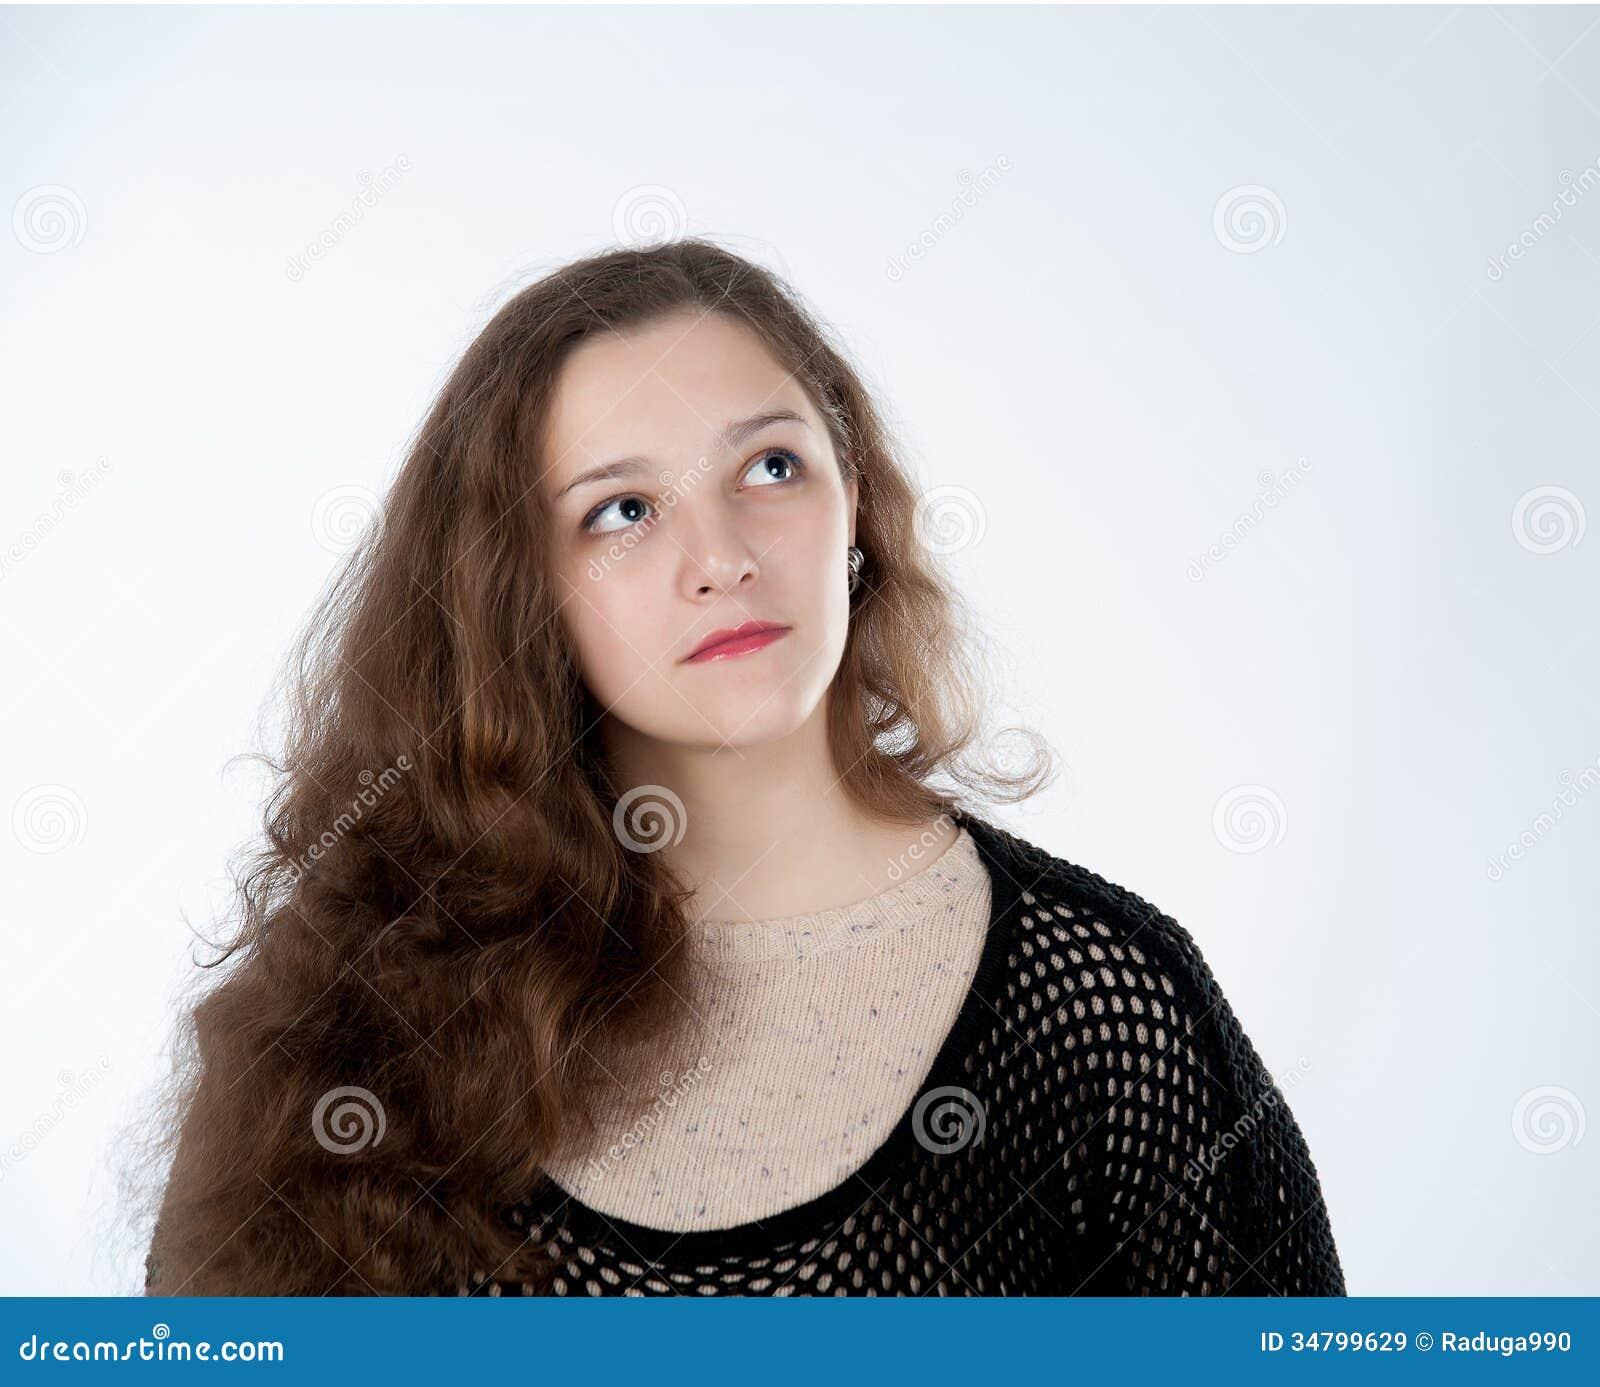 Plump women picture 27